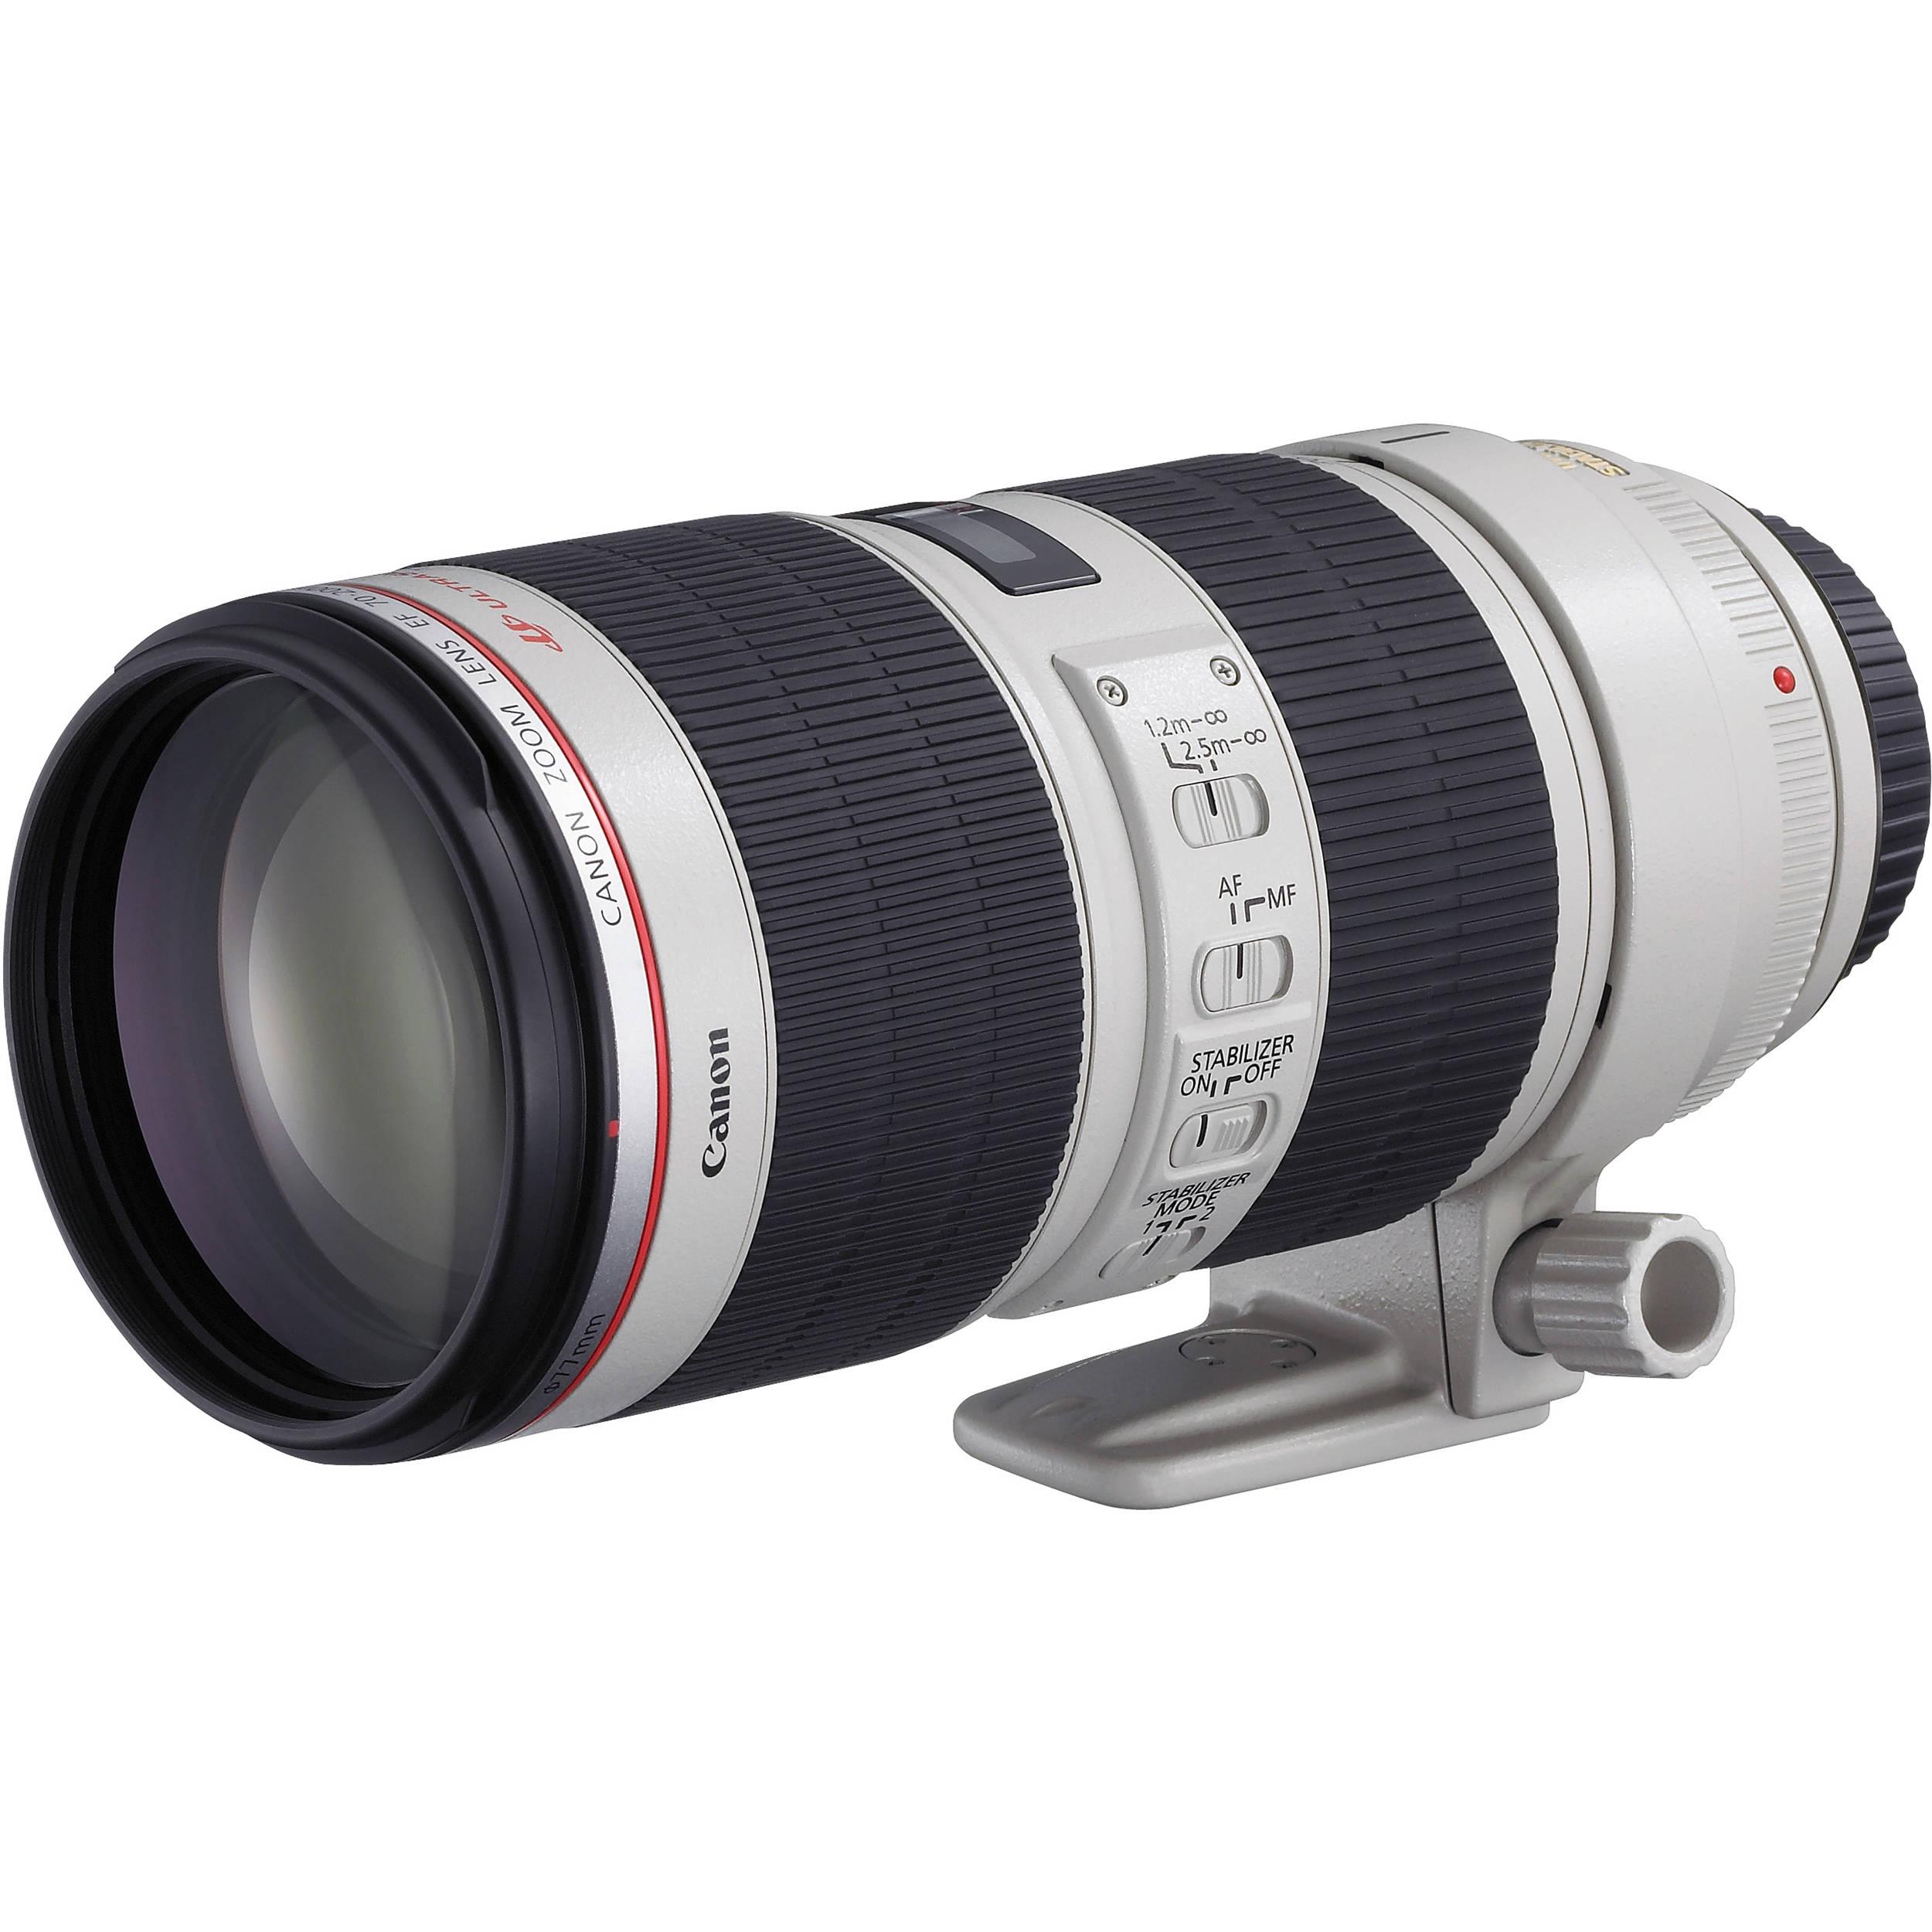 Canon_2751B002_EF_70_200mm_f_2_8L_IS_680103.jpg